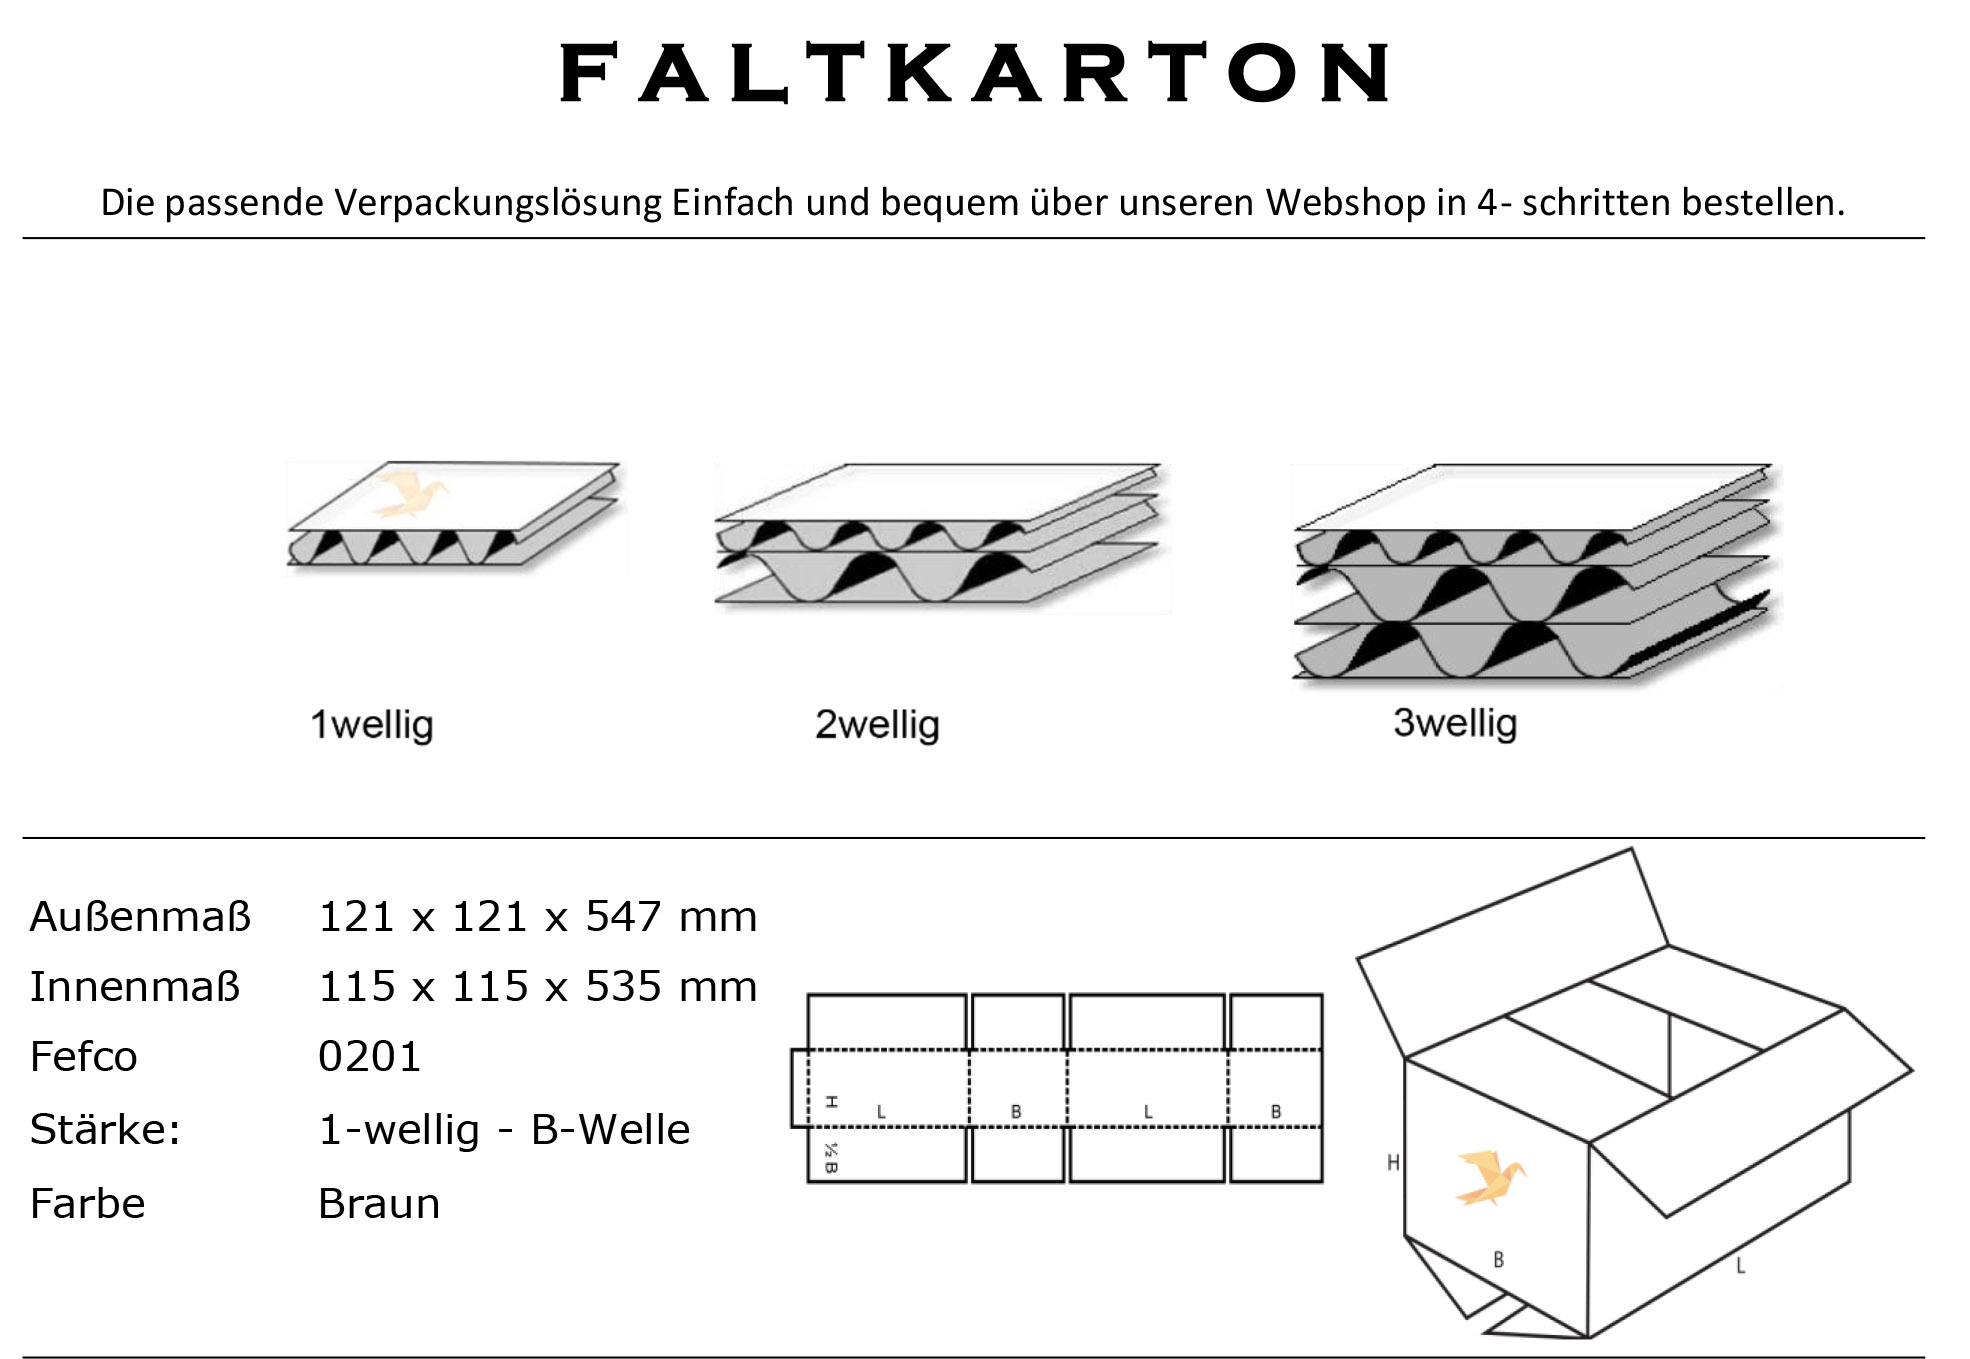 DimaPax-FALTKARTON-115x115x535mm